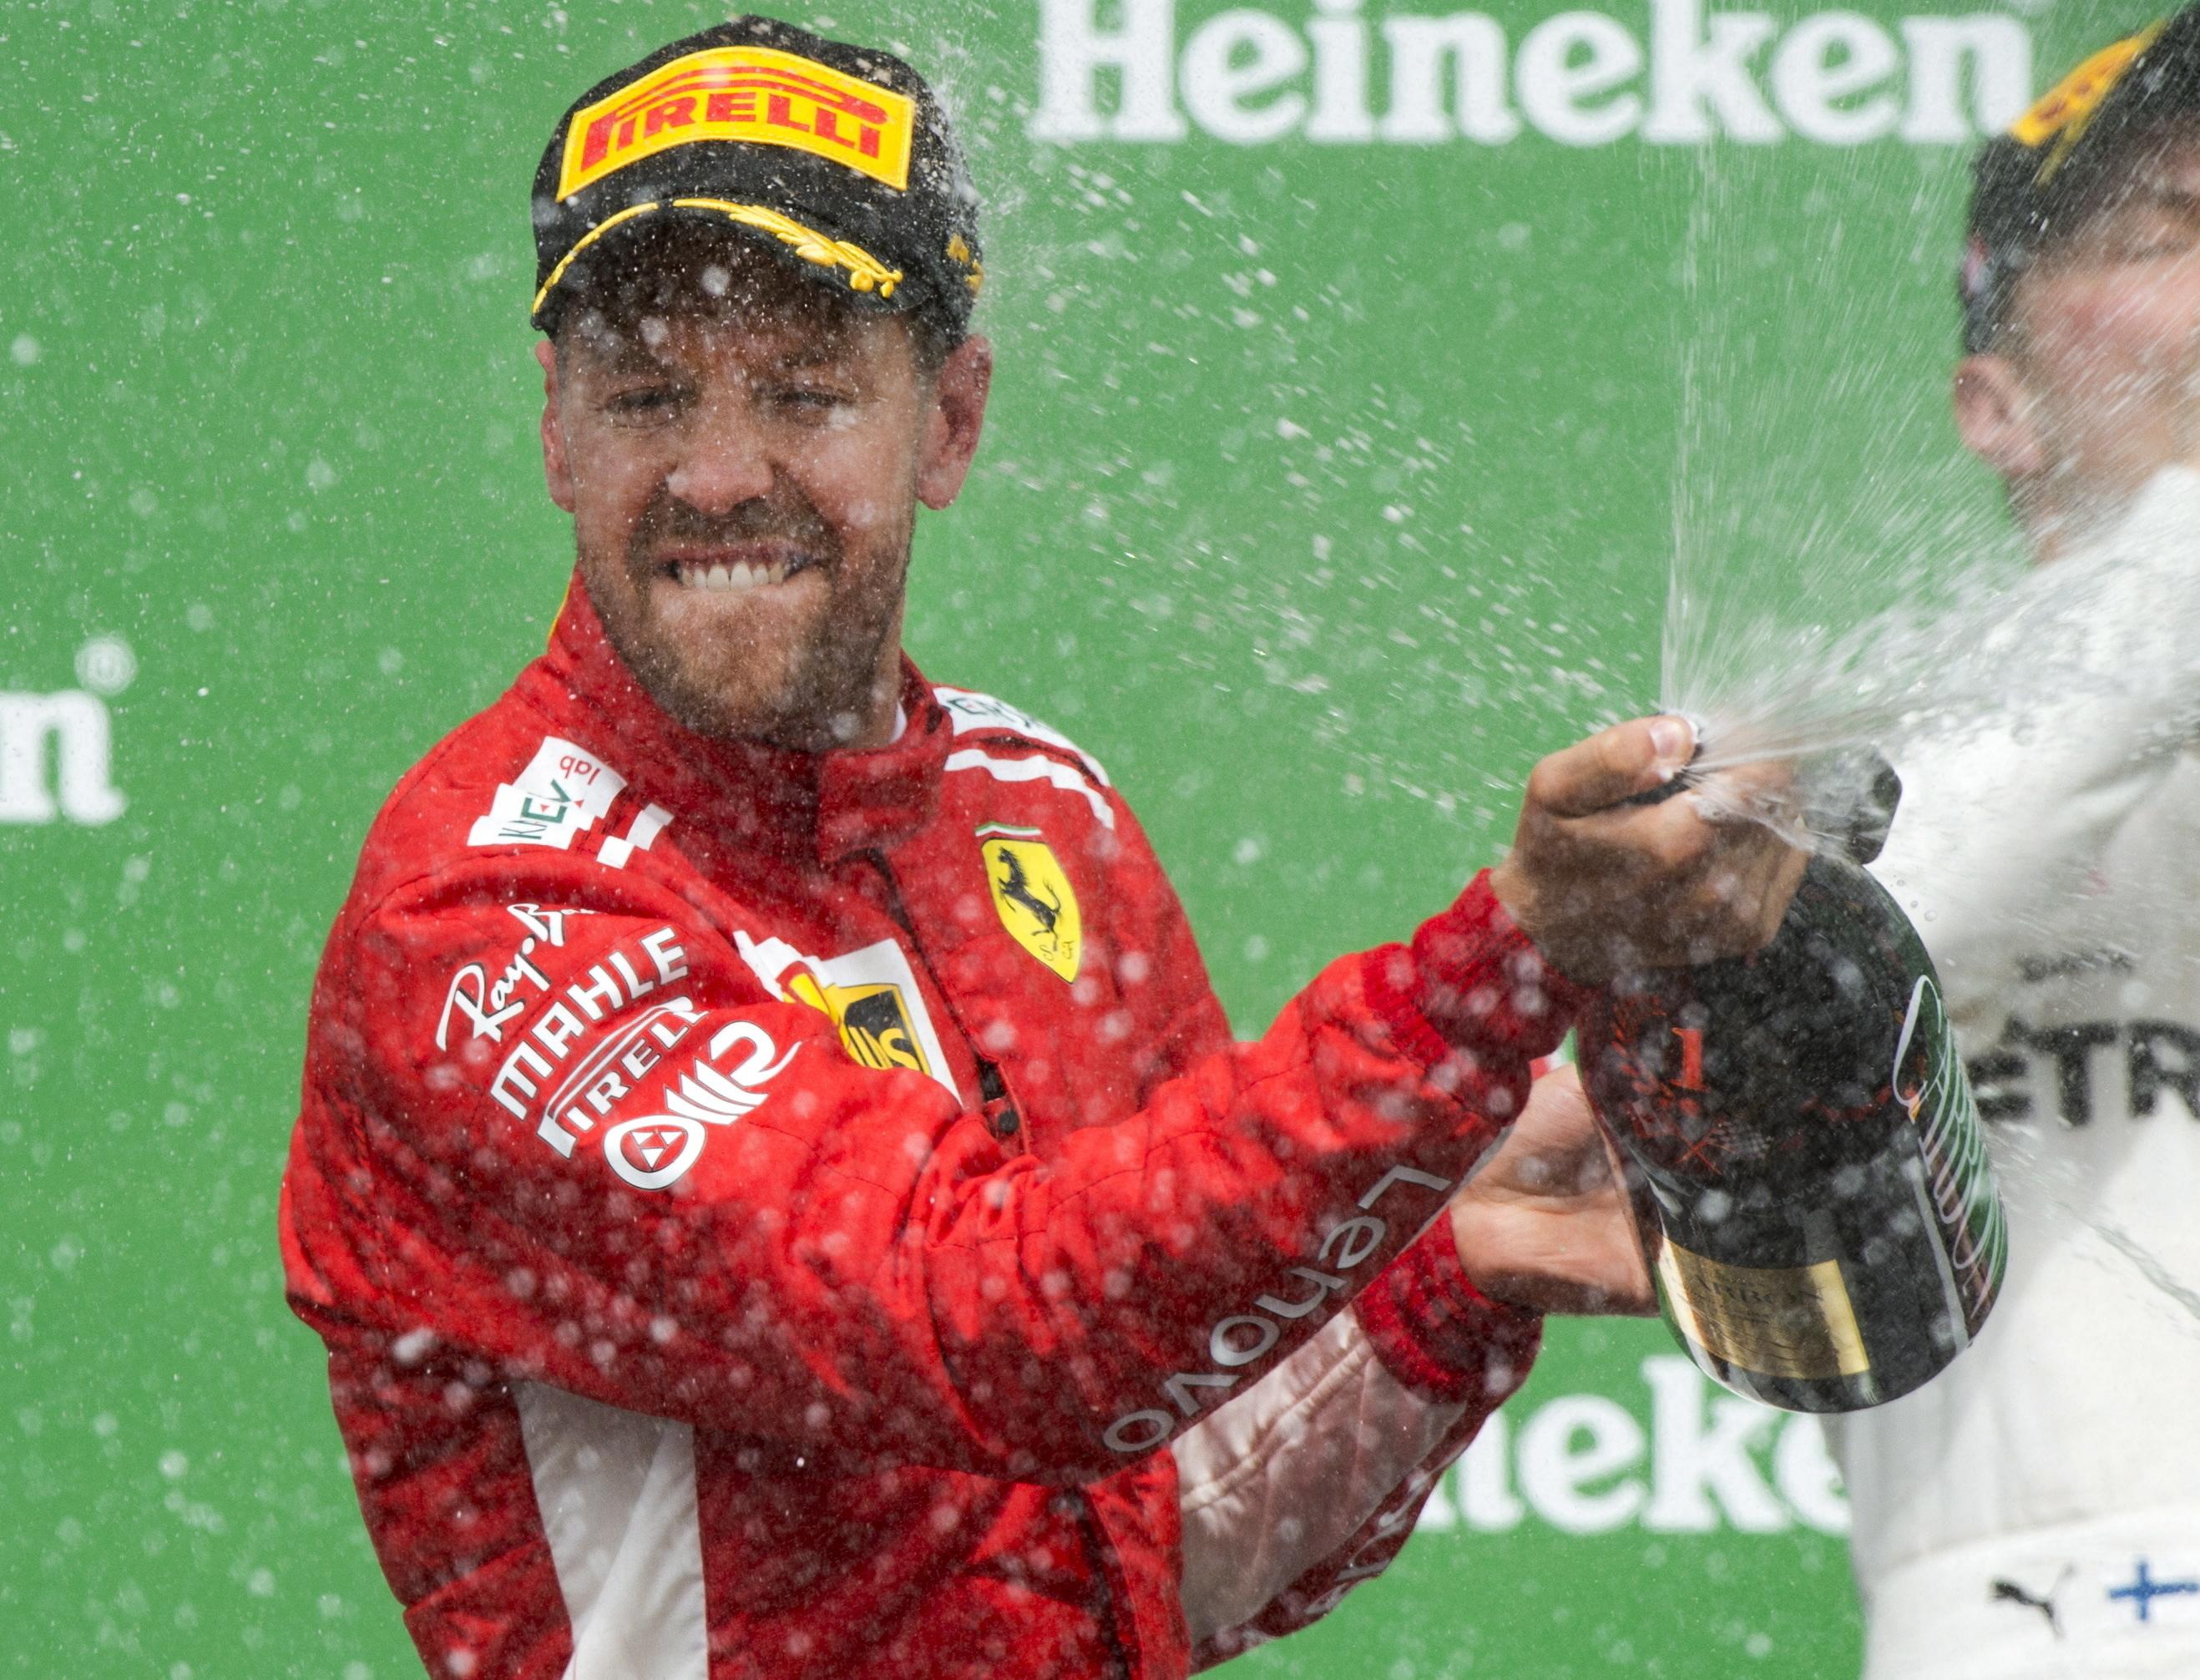 Sebastian Vettel triumphed in Canada